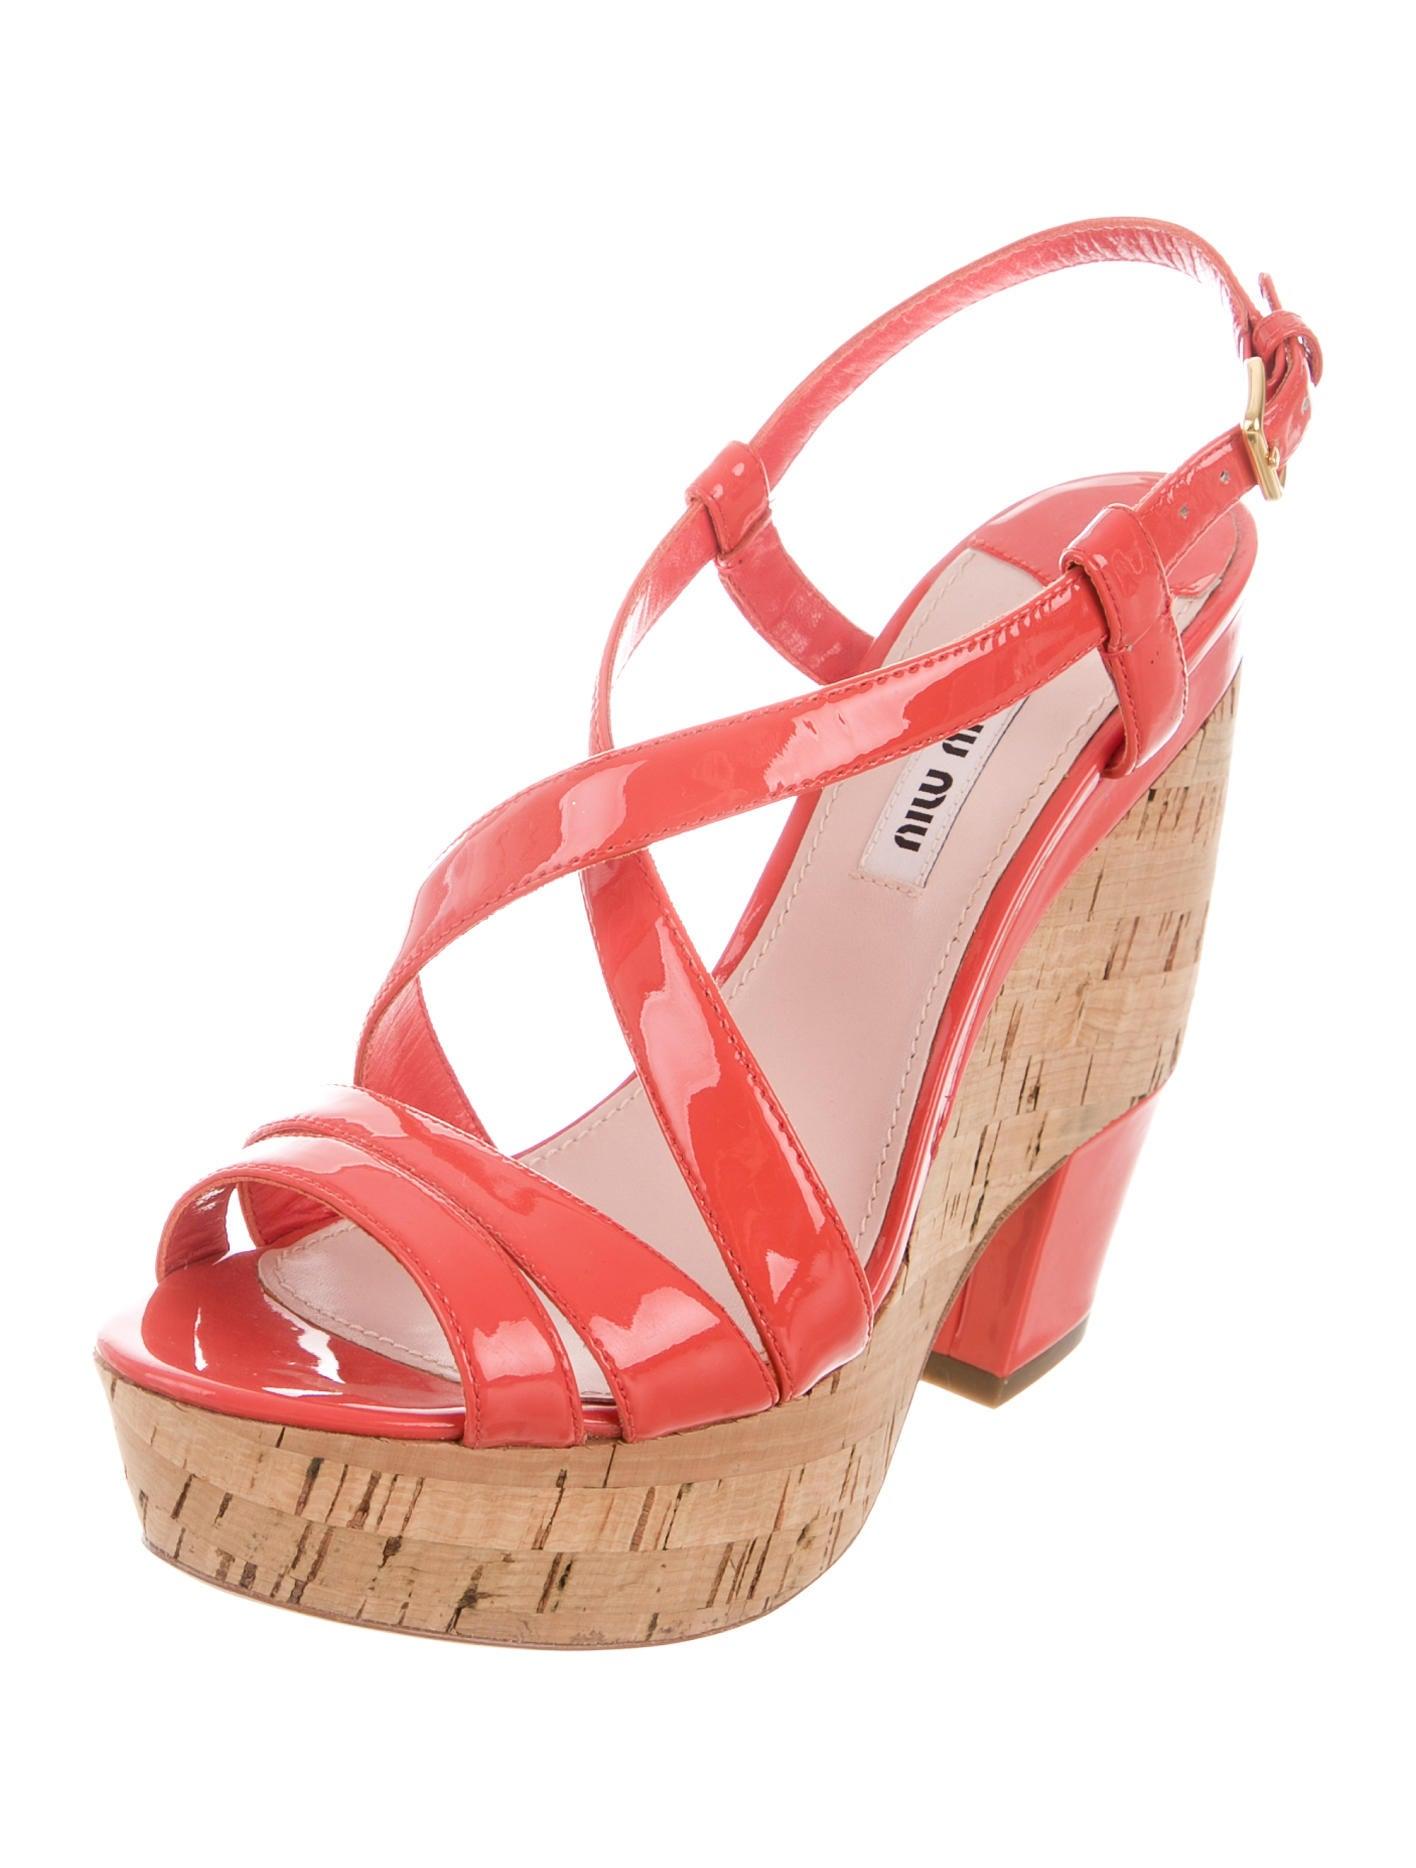 miu miu multi platform sandals shoes miu47197